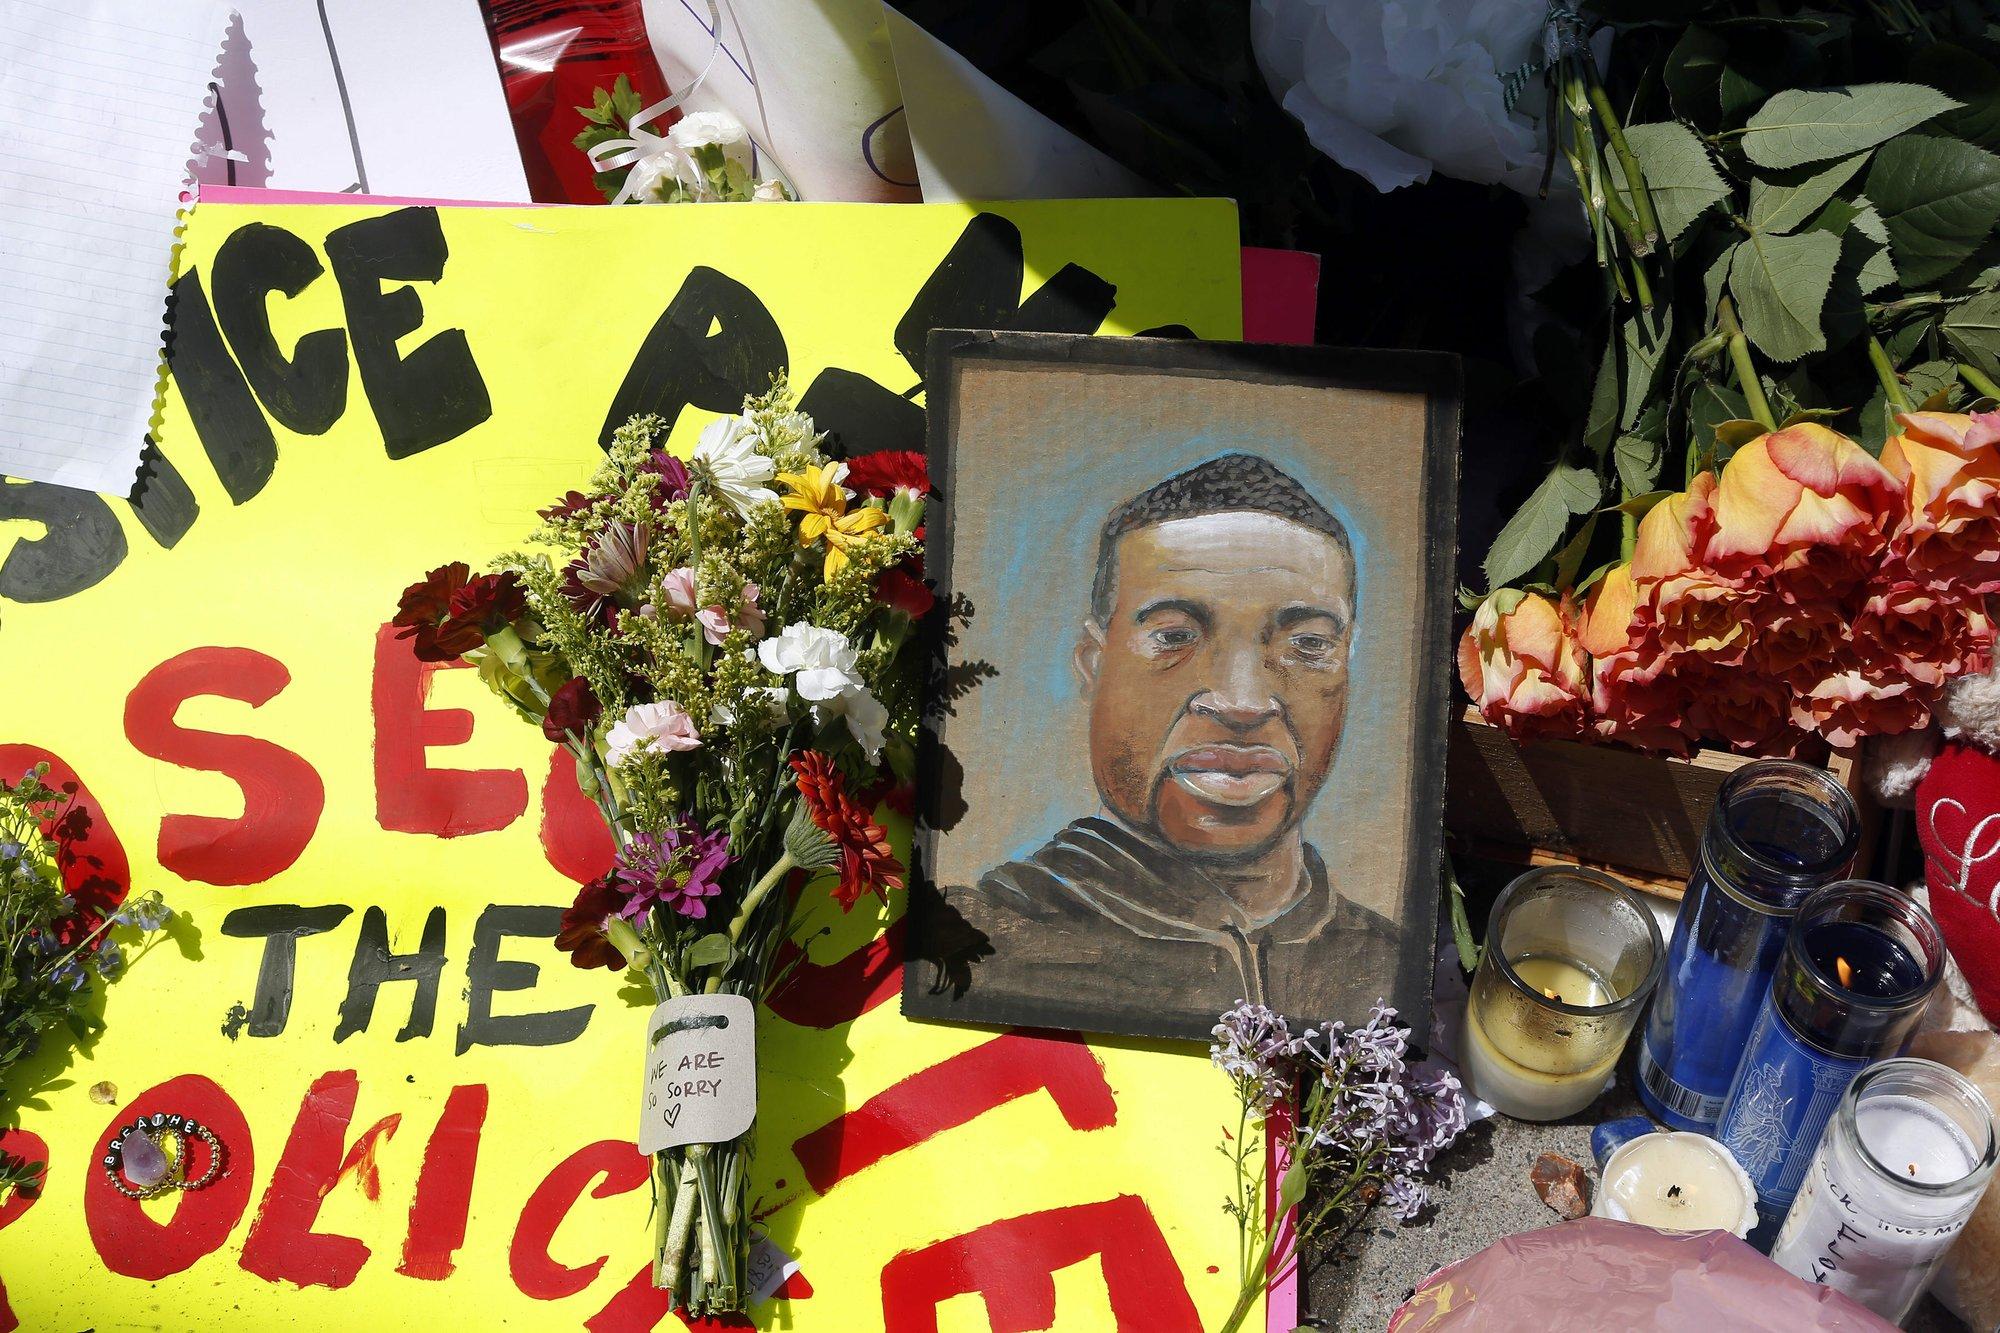 apnews.com - Todd Richmond - Victim in police encounter had started new life in Minnesota